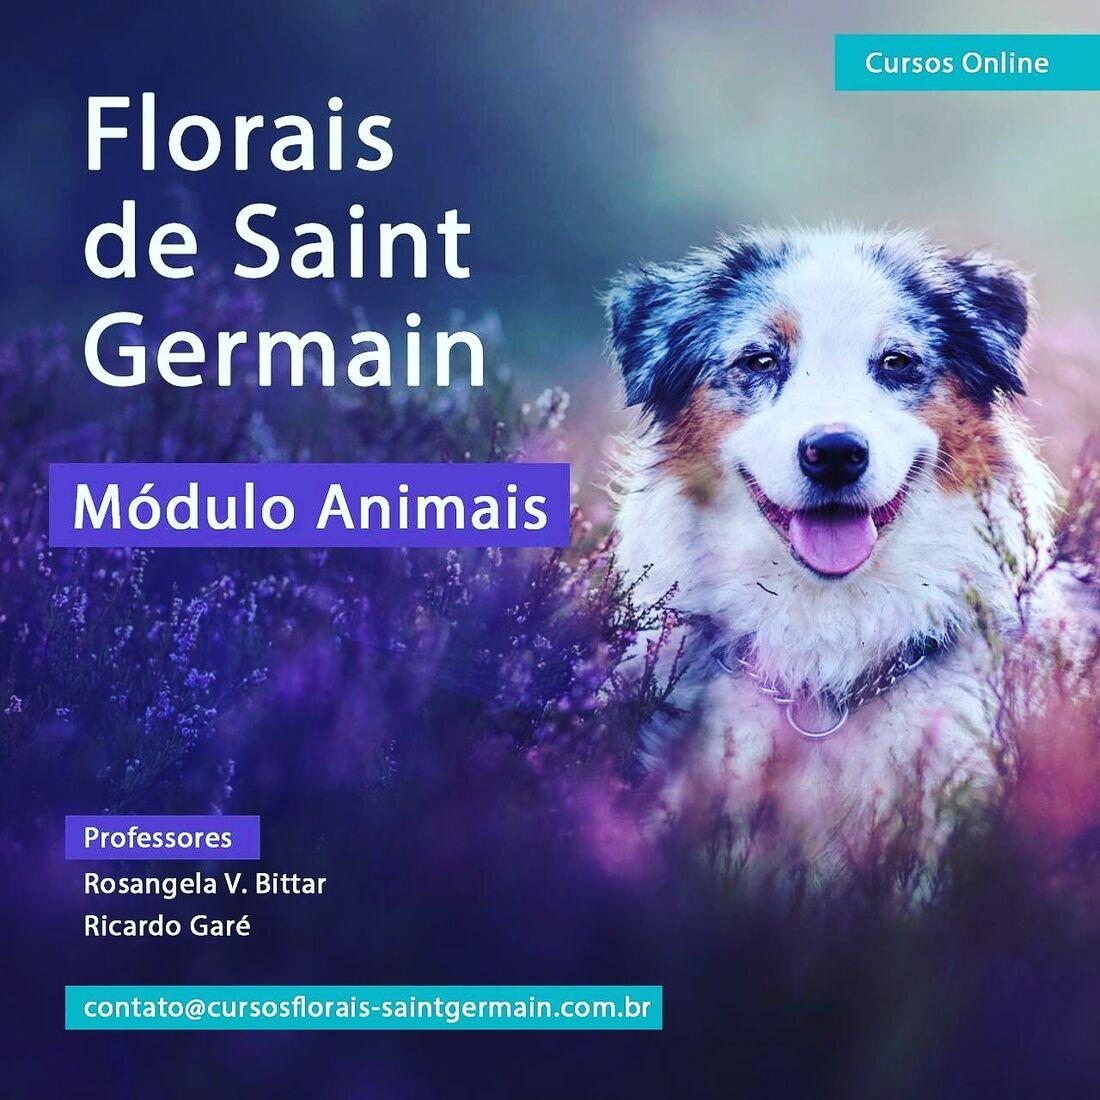 EVENTO CURSO ONLINE Florais de Saint Germain - Módulo Animais